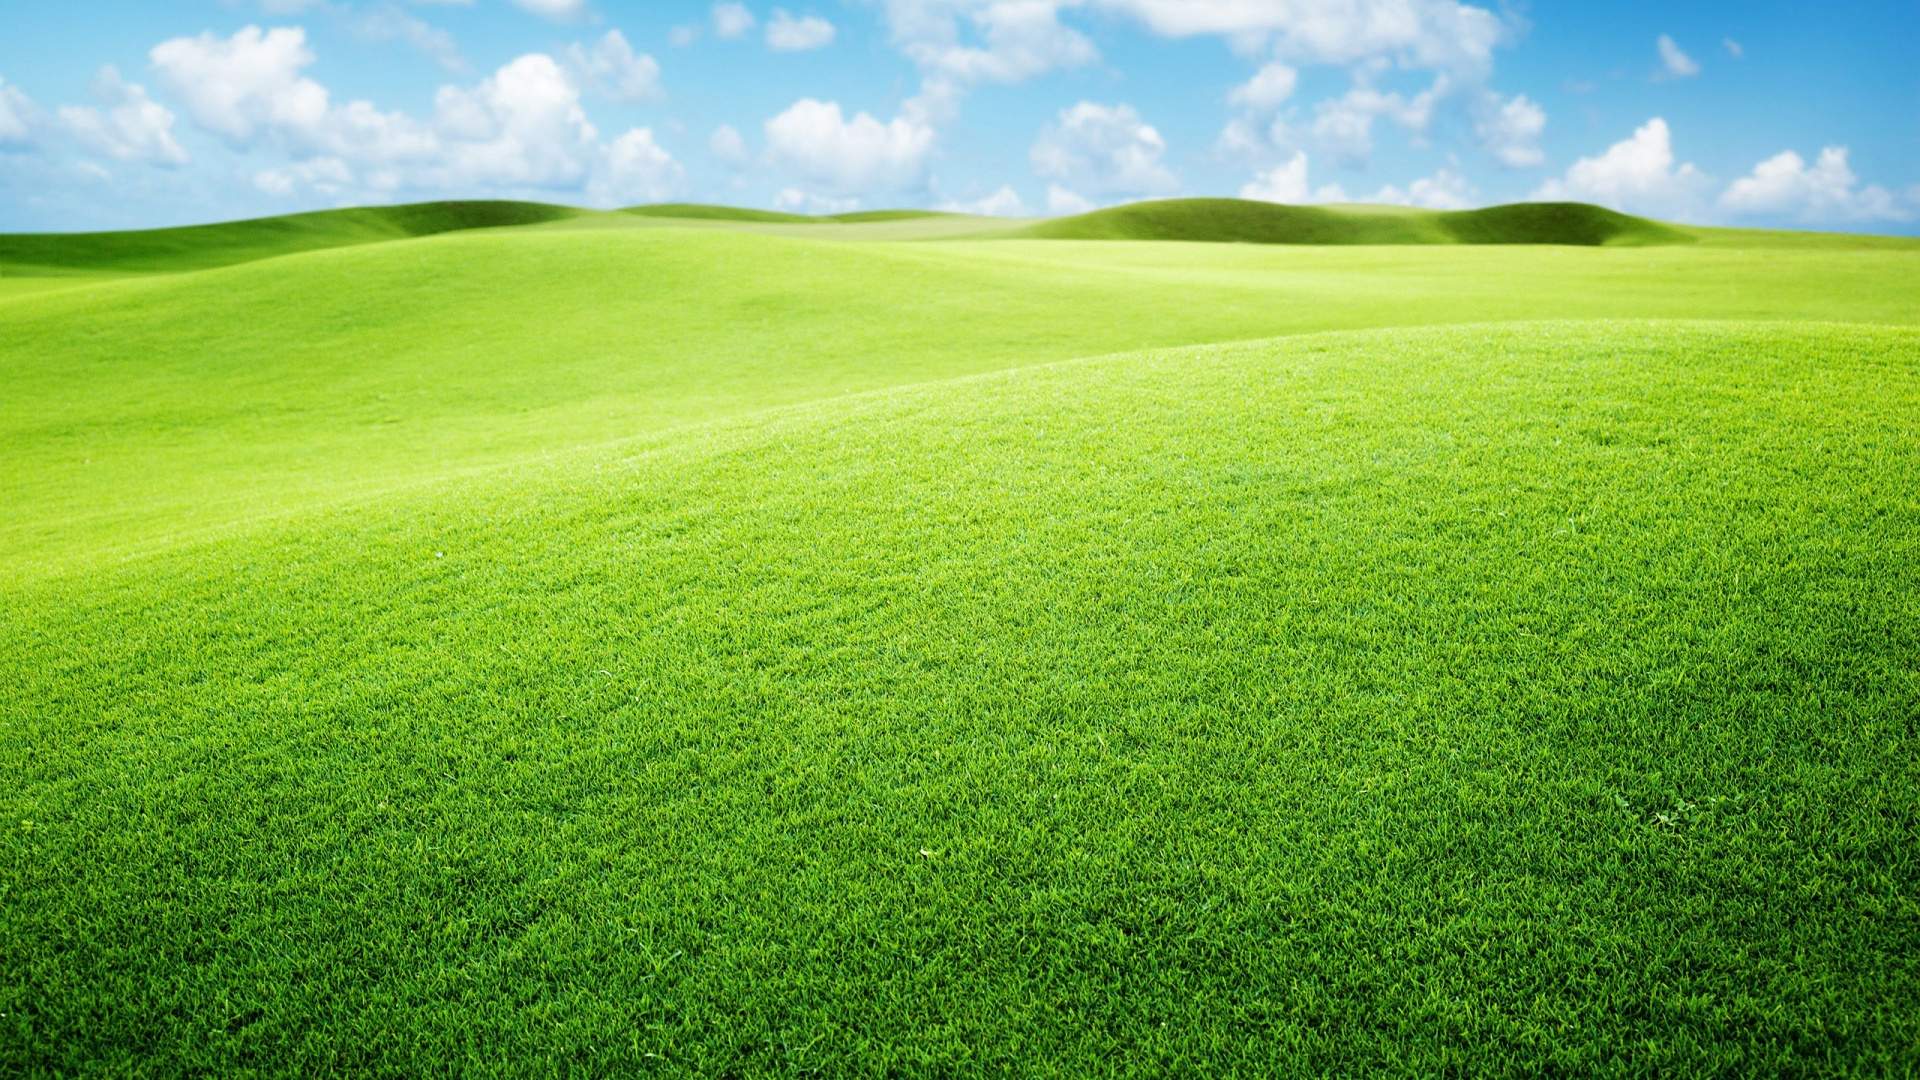 Green Landscape Wallpaper | HD Desktop Background